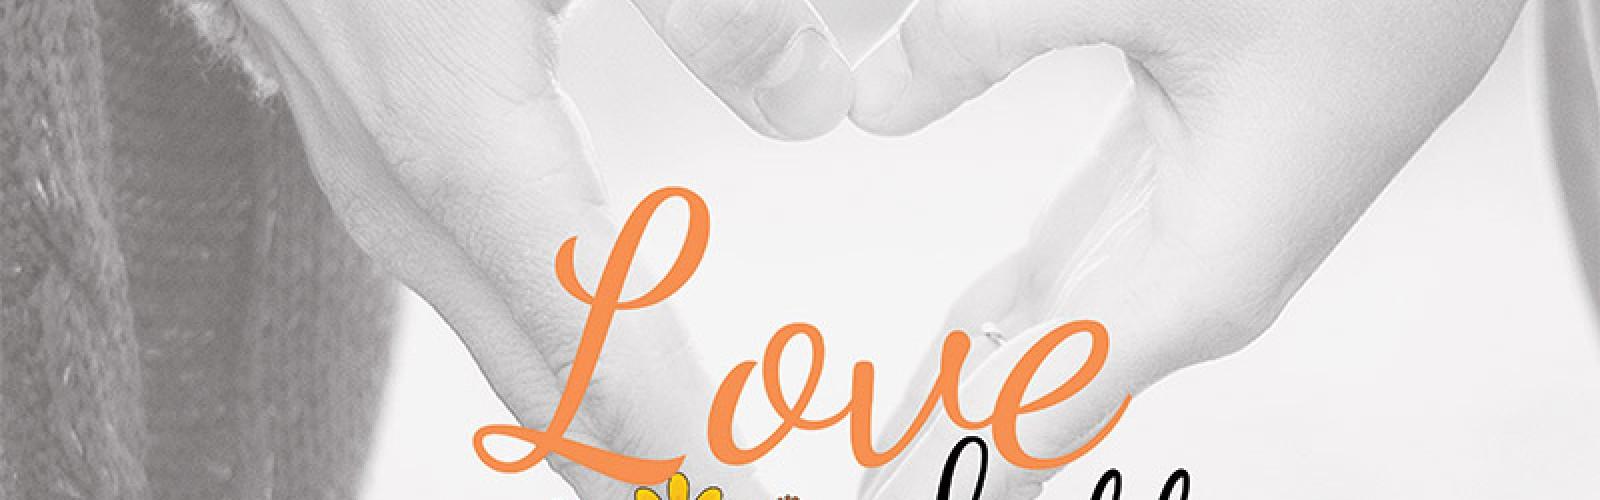 "Waynesboro Players present ""Love Letters"""